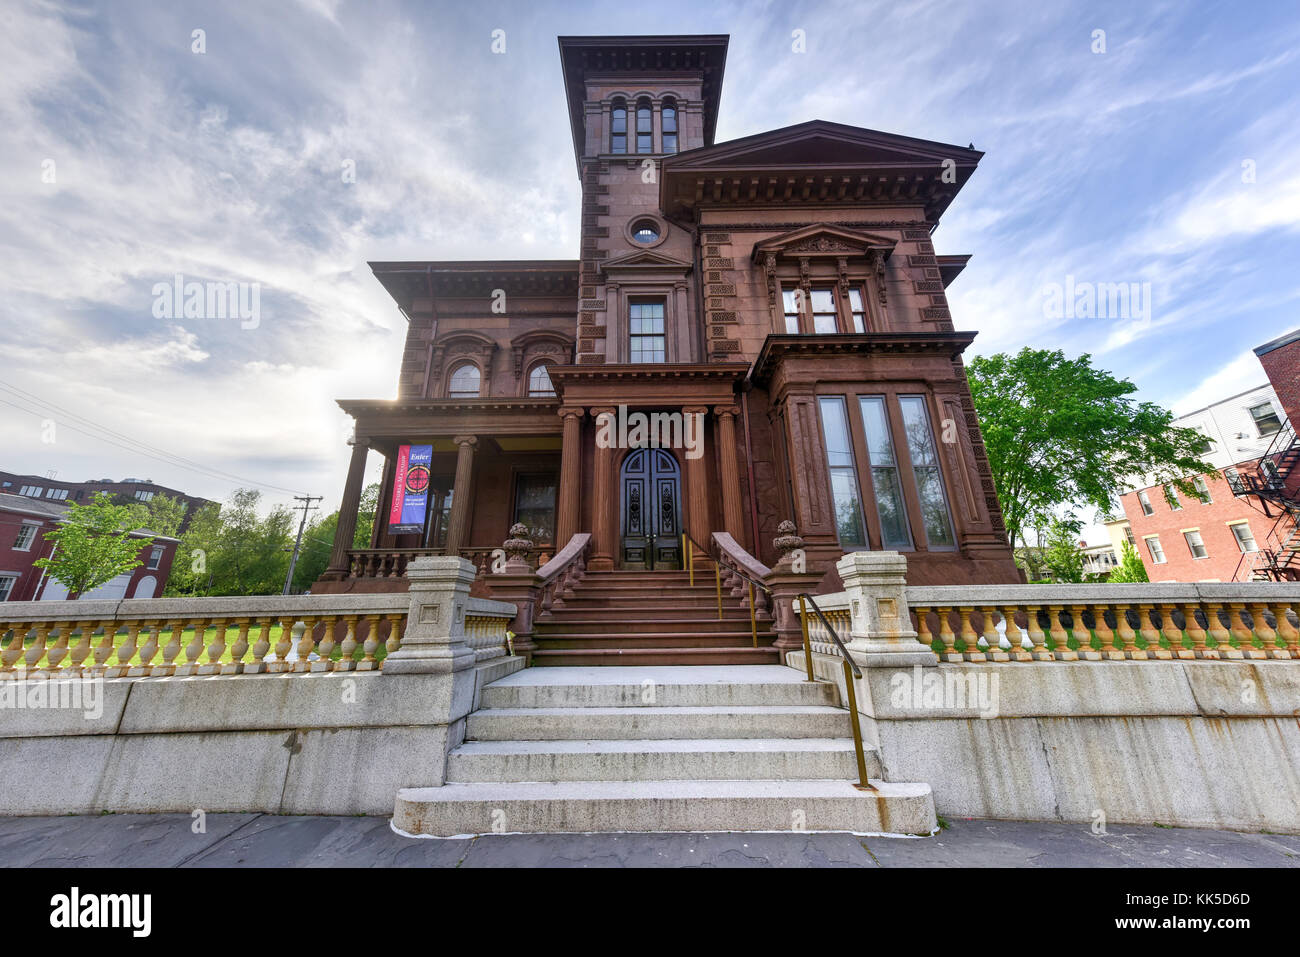 video portland victorian mansion - HD1100×875